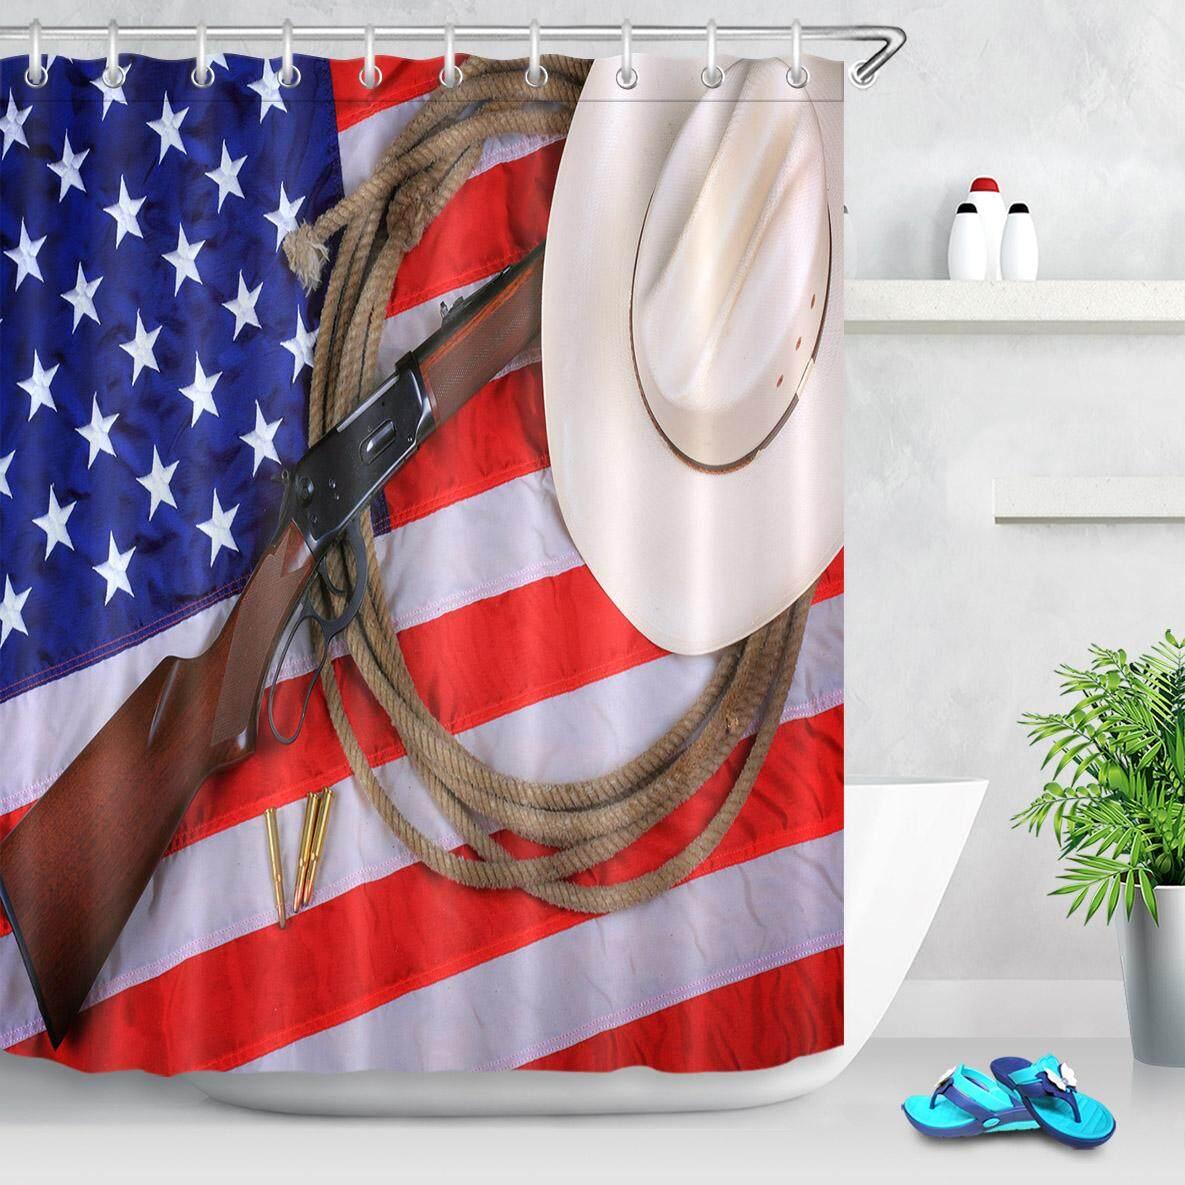 360dsc Eropa & Amerika Serikat 3d Stiker Toilet Kamar Mandi Dekorasi ... - Rp 168.000. Source ... Bendera Amerika Koboi 180X180 Cm Gorden Mandi Tahan Air ...